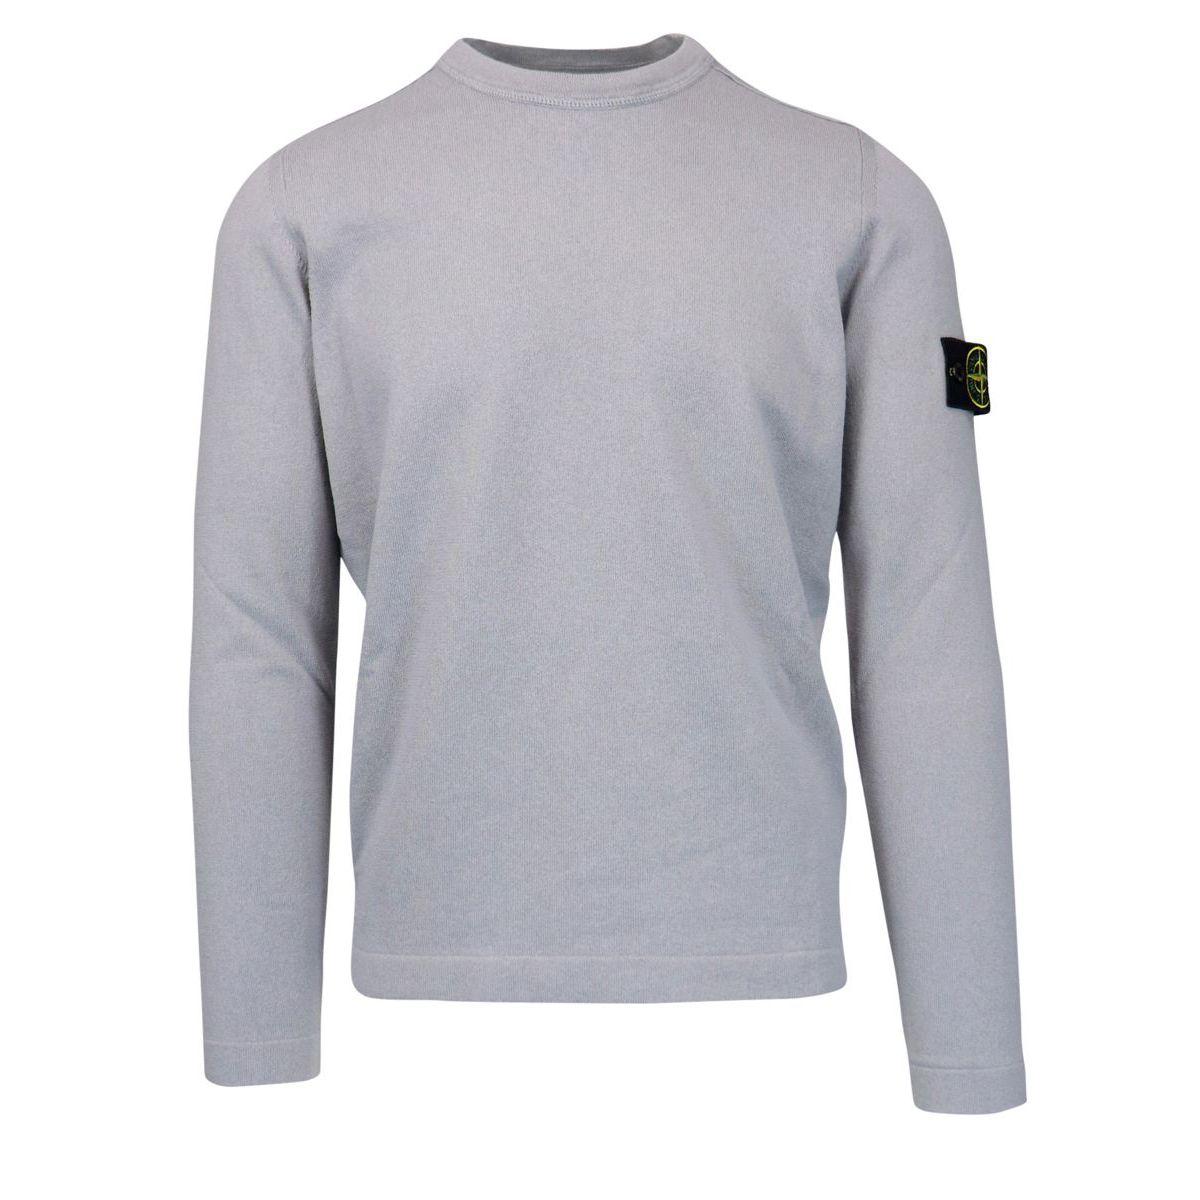 Crew neck cotton sweater with logo patch Powder Stone Island